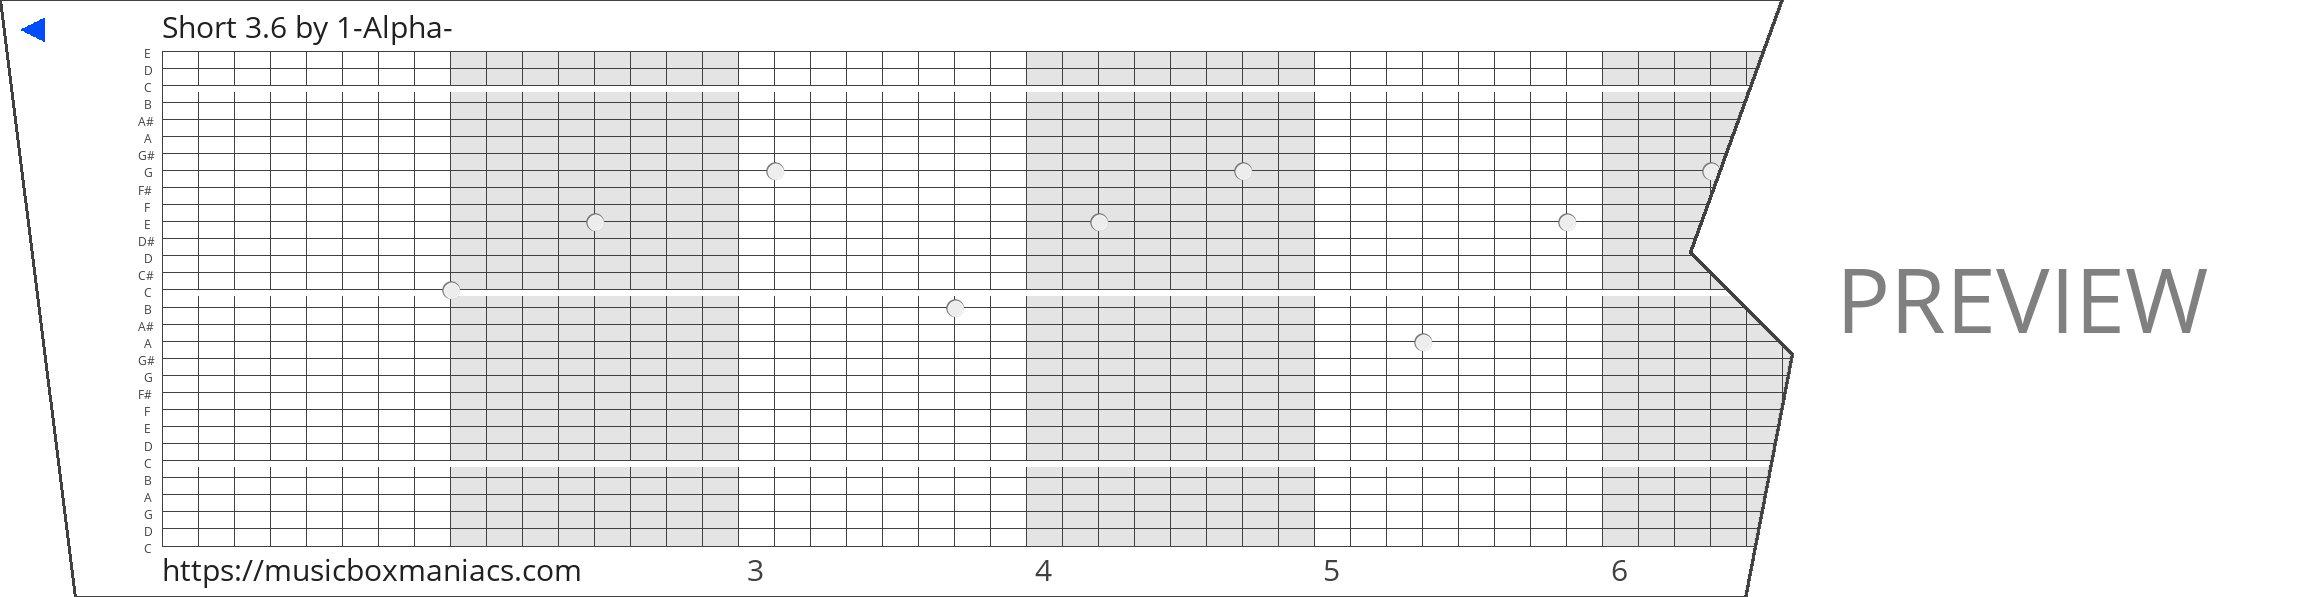 Short 3.6 30 note music box paper strip